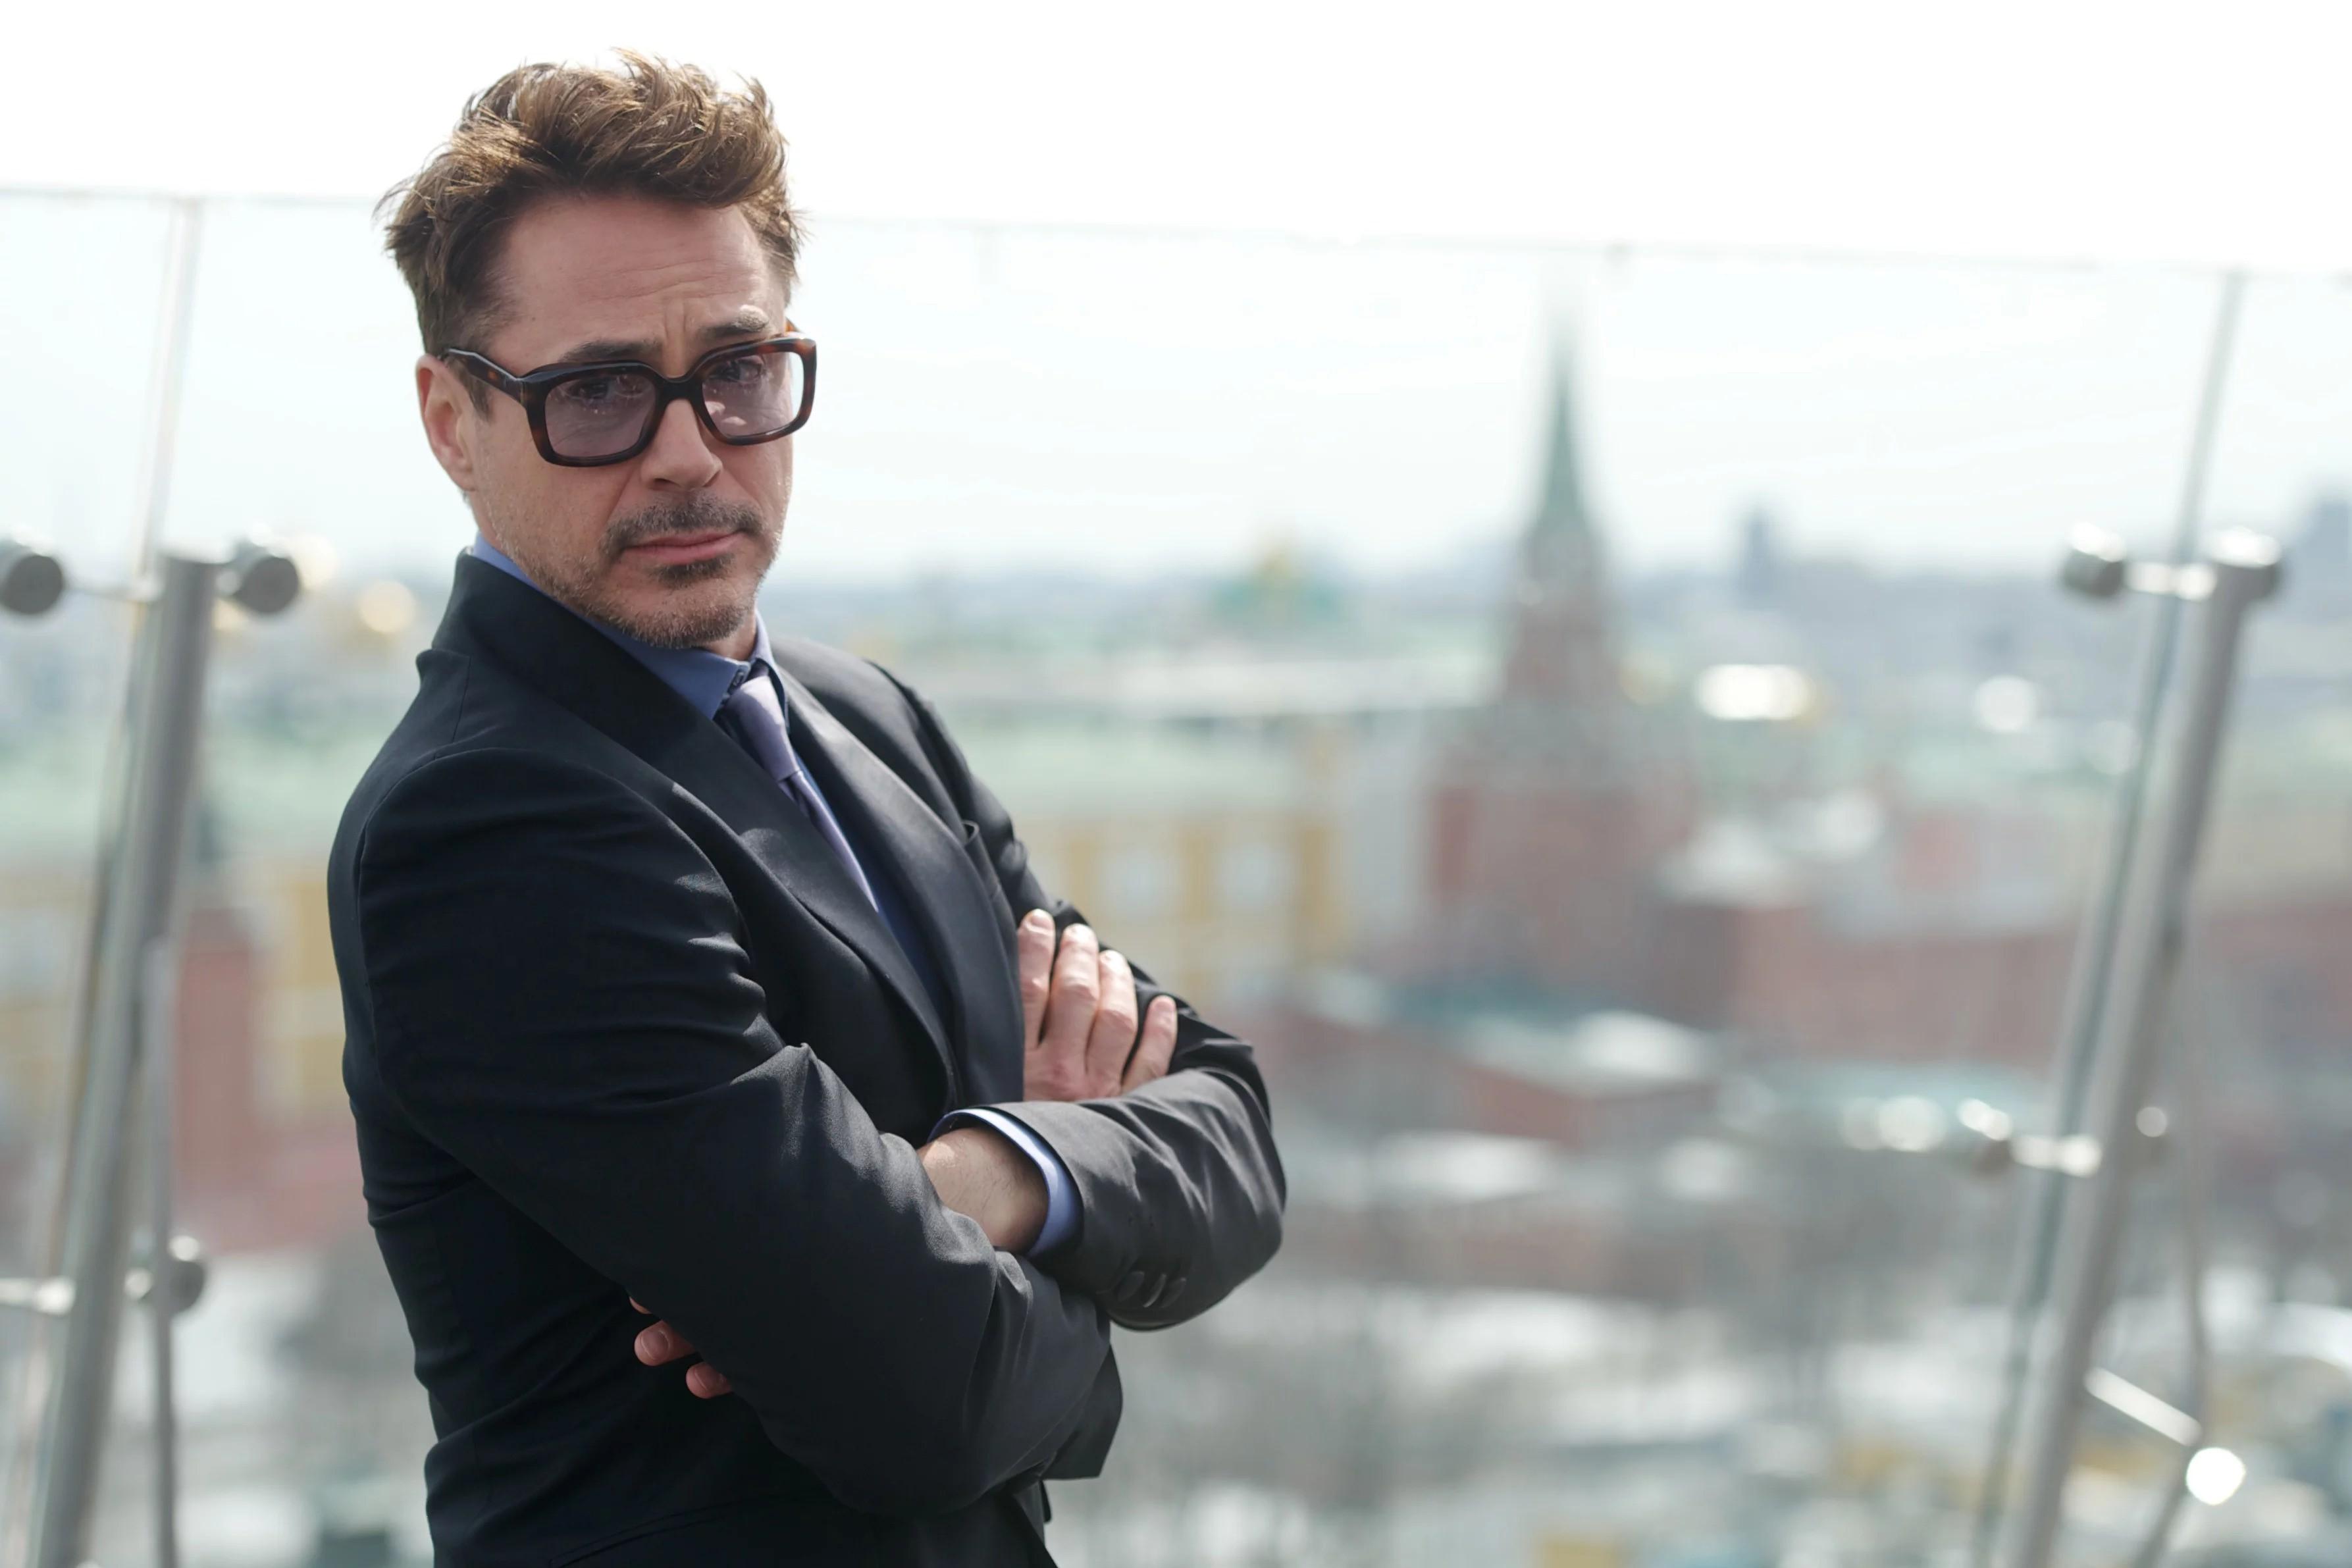 Robert Downey Jr Famous American Actor Wallpaper HD Wallpapers 3573x2382